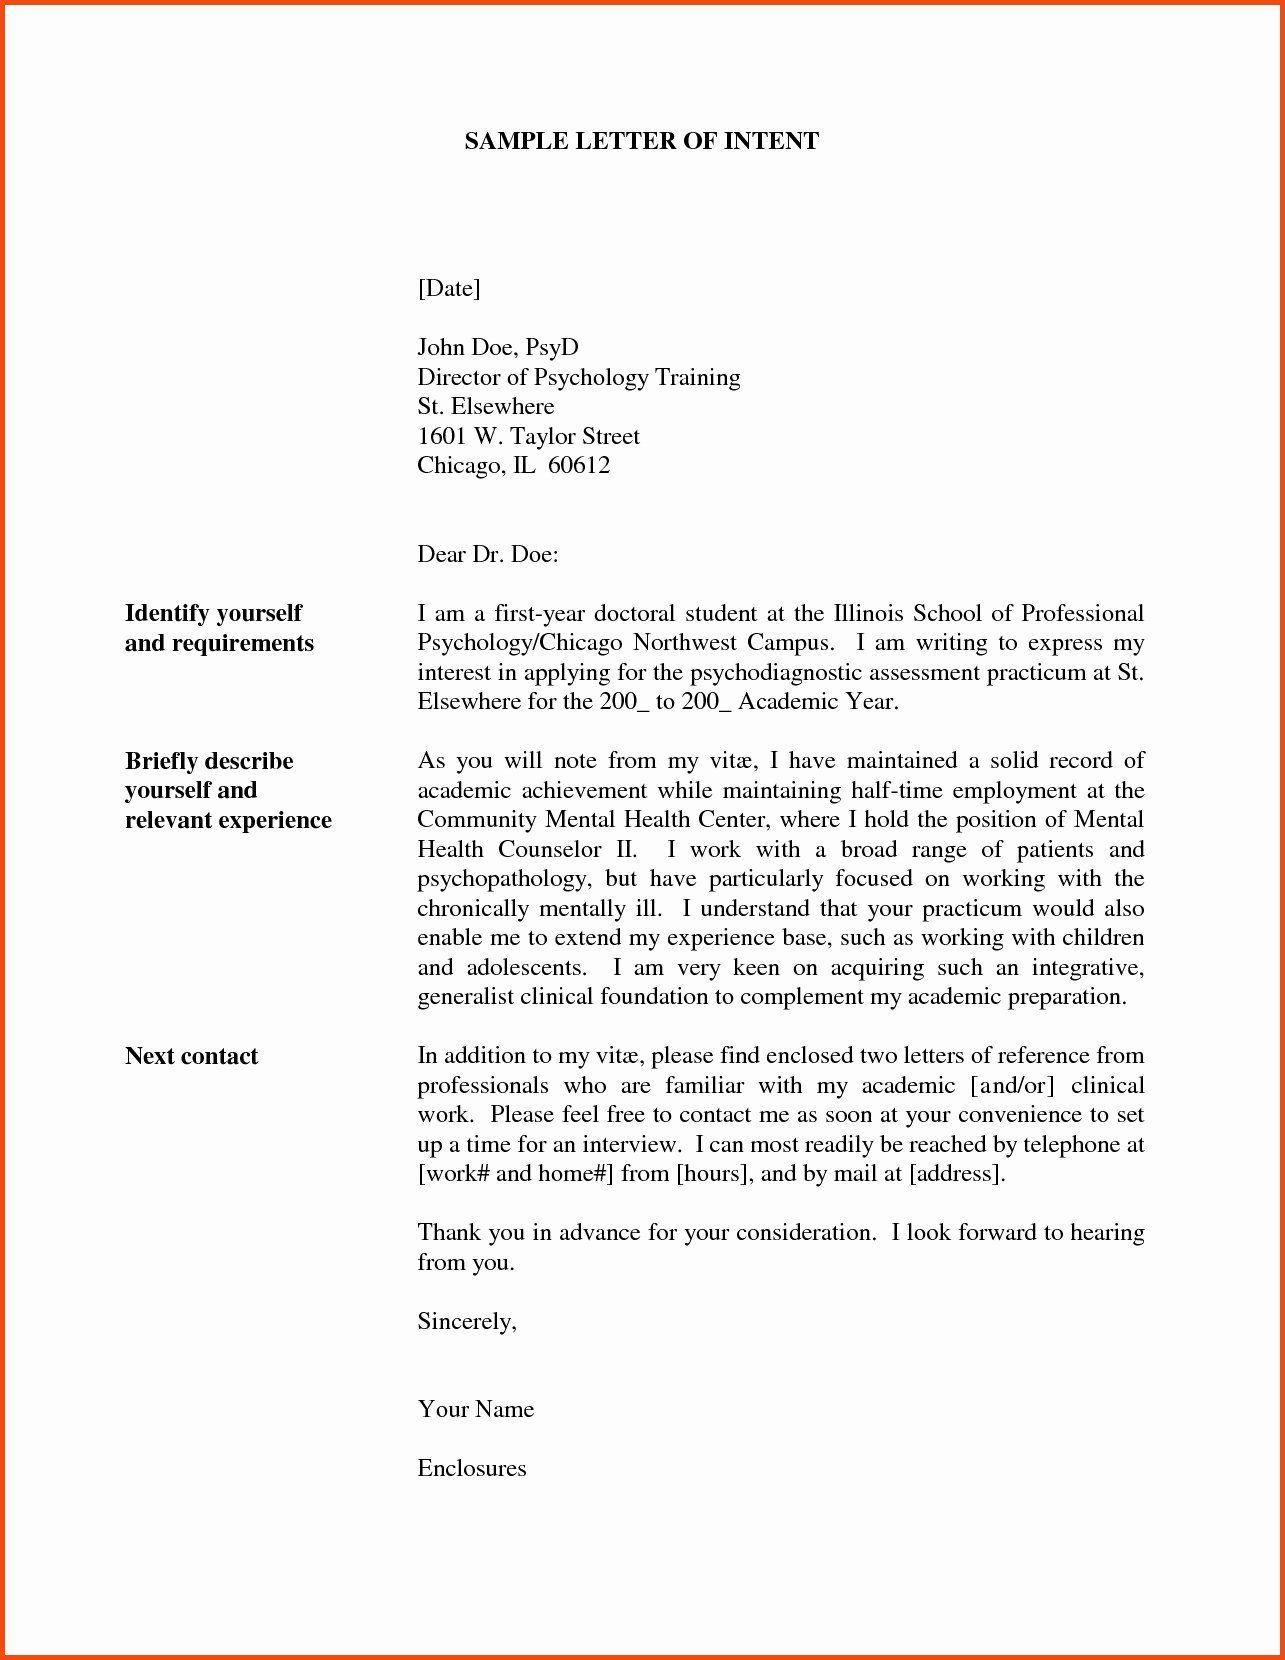 Letter Of Intent For Promotion Best Of Letter Intent For Promotion Template Collection Letter Of Intent Letter Example Lettering